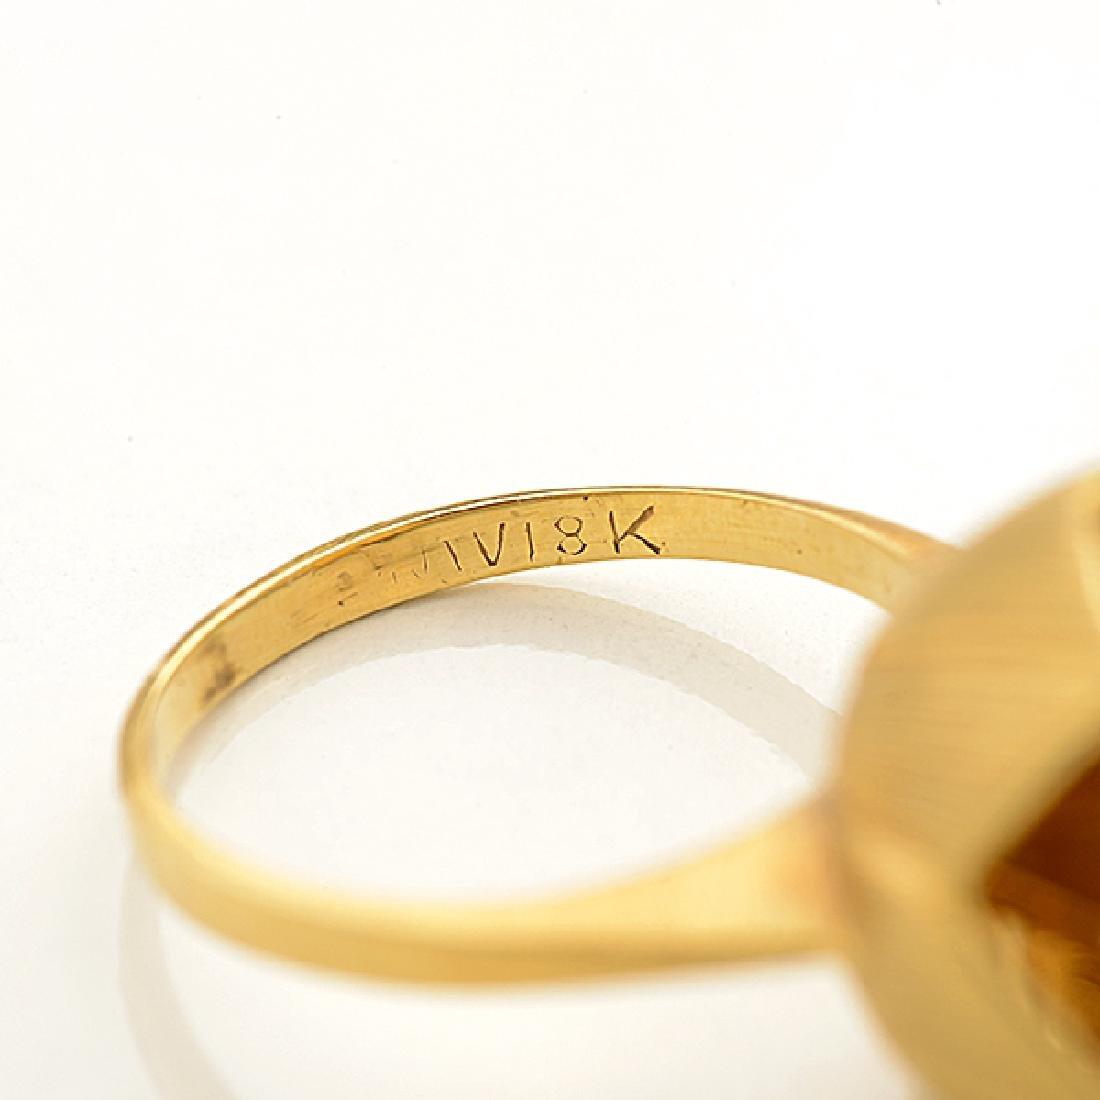 Diamond, Pink Sapphire, 18k Yellow Gold Ring. - 4